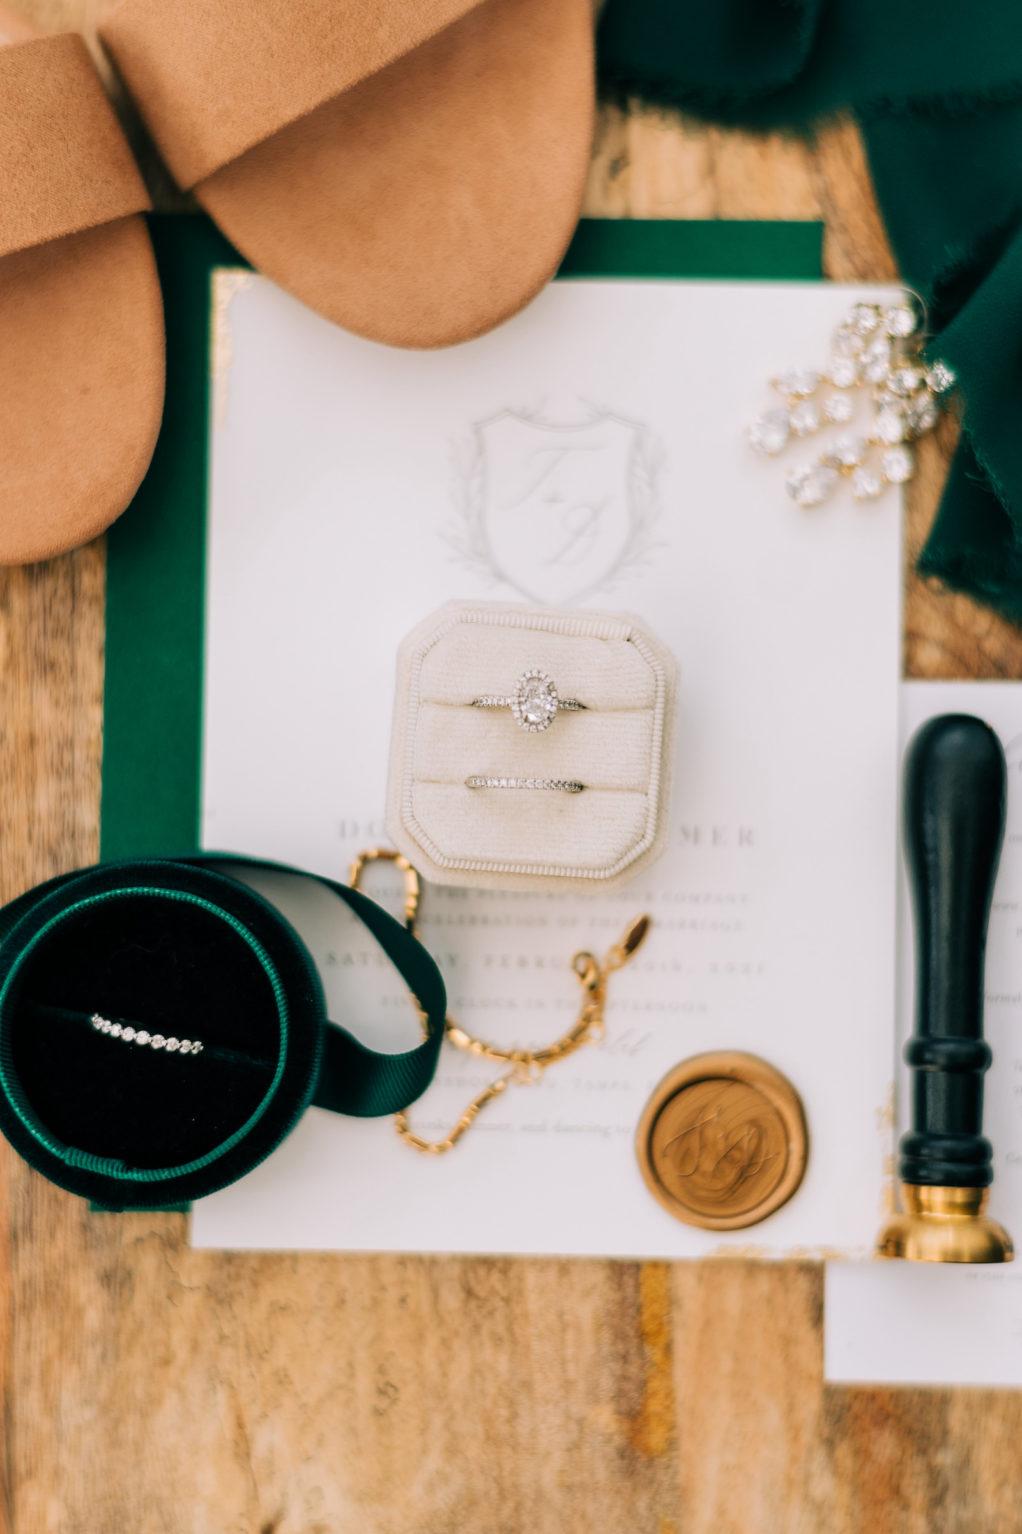 Oval Diamond Engagement Ring in Ivory Velvet Ring Box, Diamond Wedding Band in Green Velvet Ring Box, Custom Wax Seal Stamp, Classic White Wedding Invitation